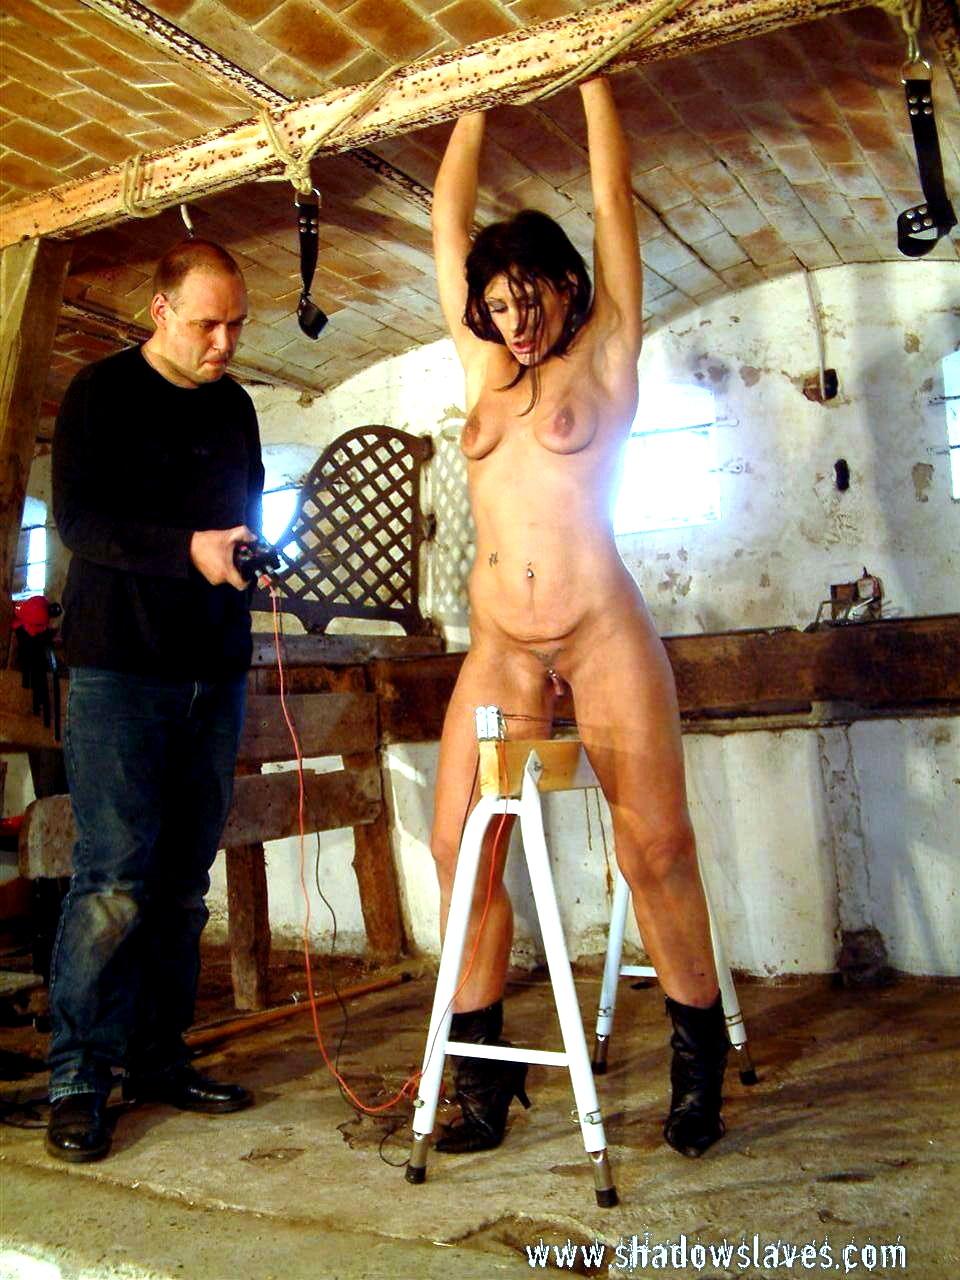 Wooden horse torture porn